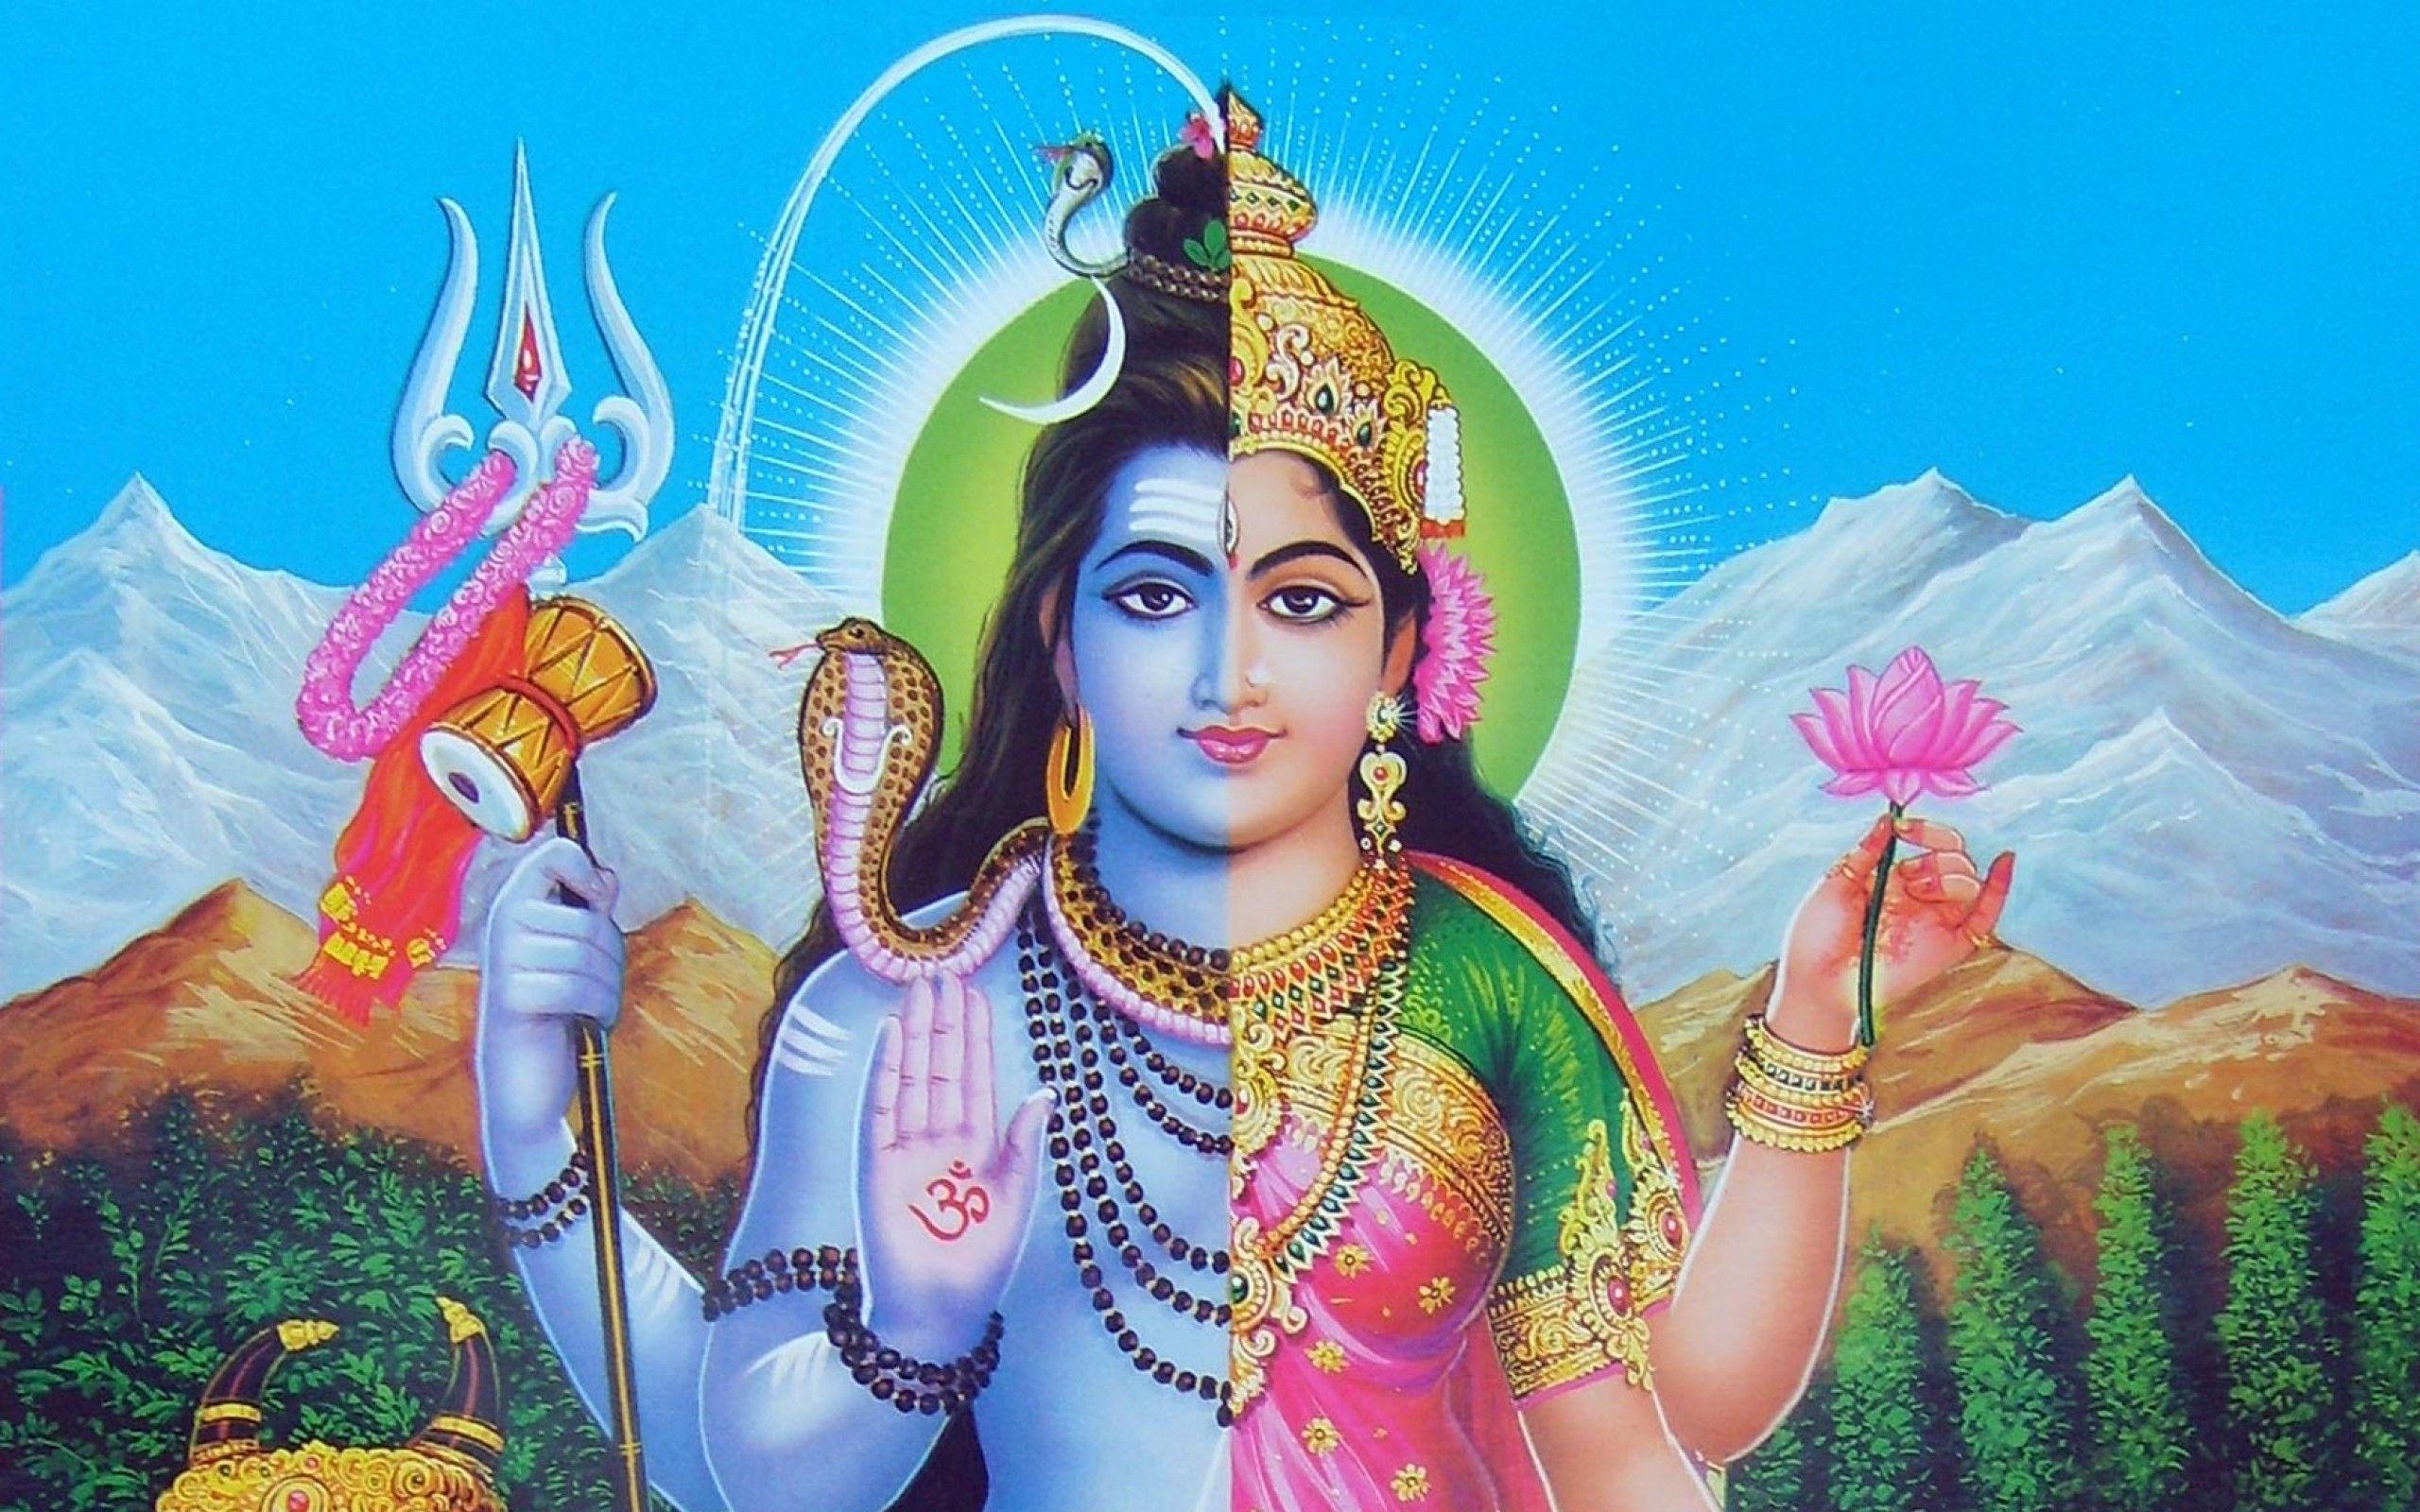 Hd wallpaper bholenath - Wallpaper Download Bholenath Lord Shiva Angry Bholenath Shiv Sankar Bhagvan Hd Wallpaper